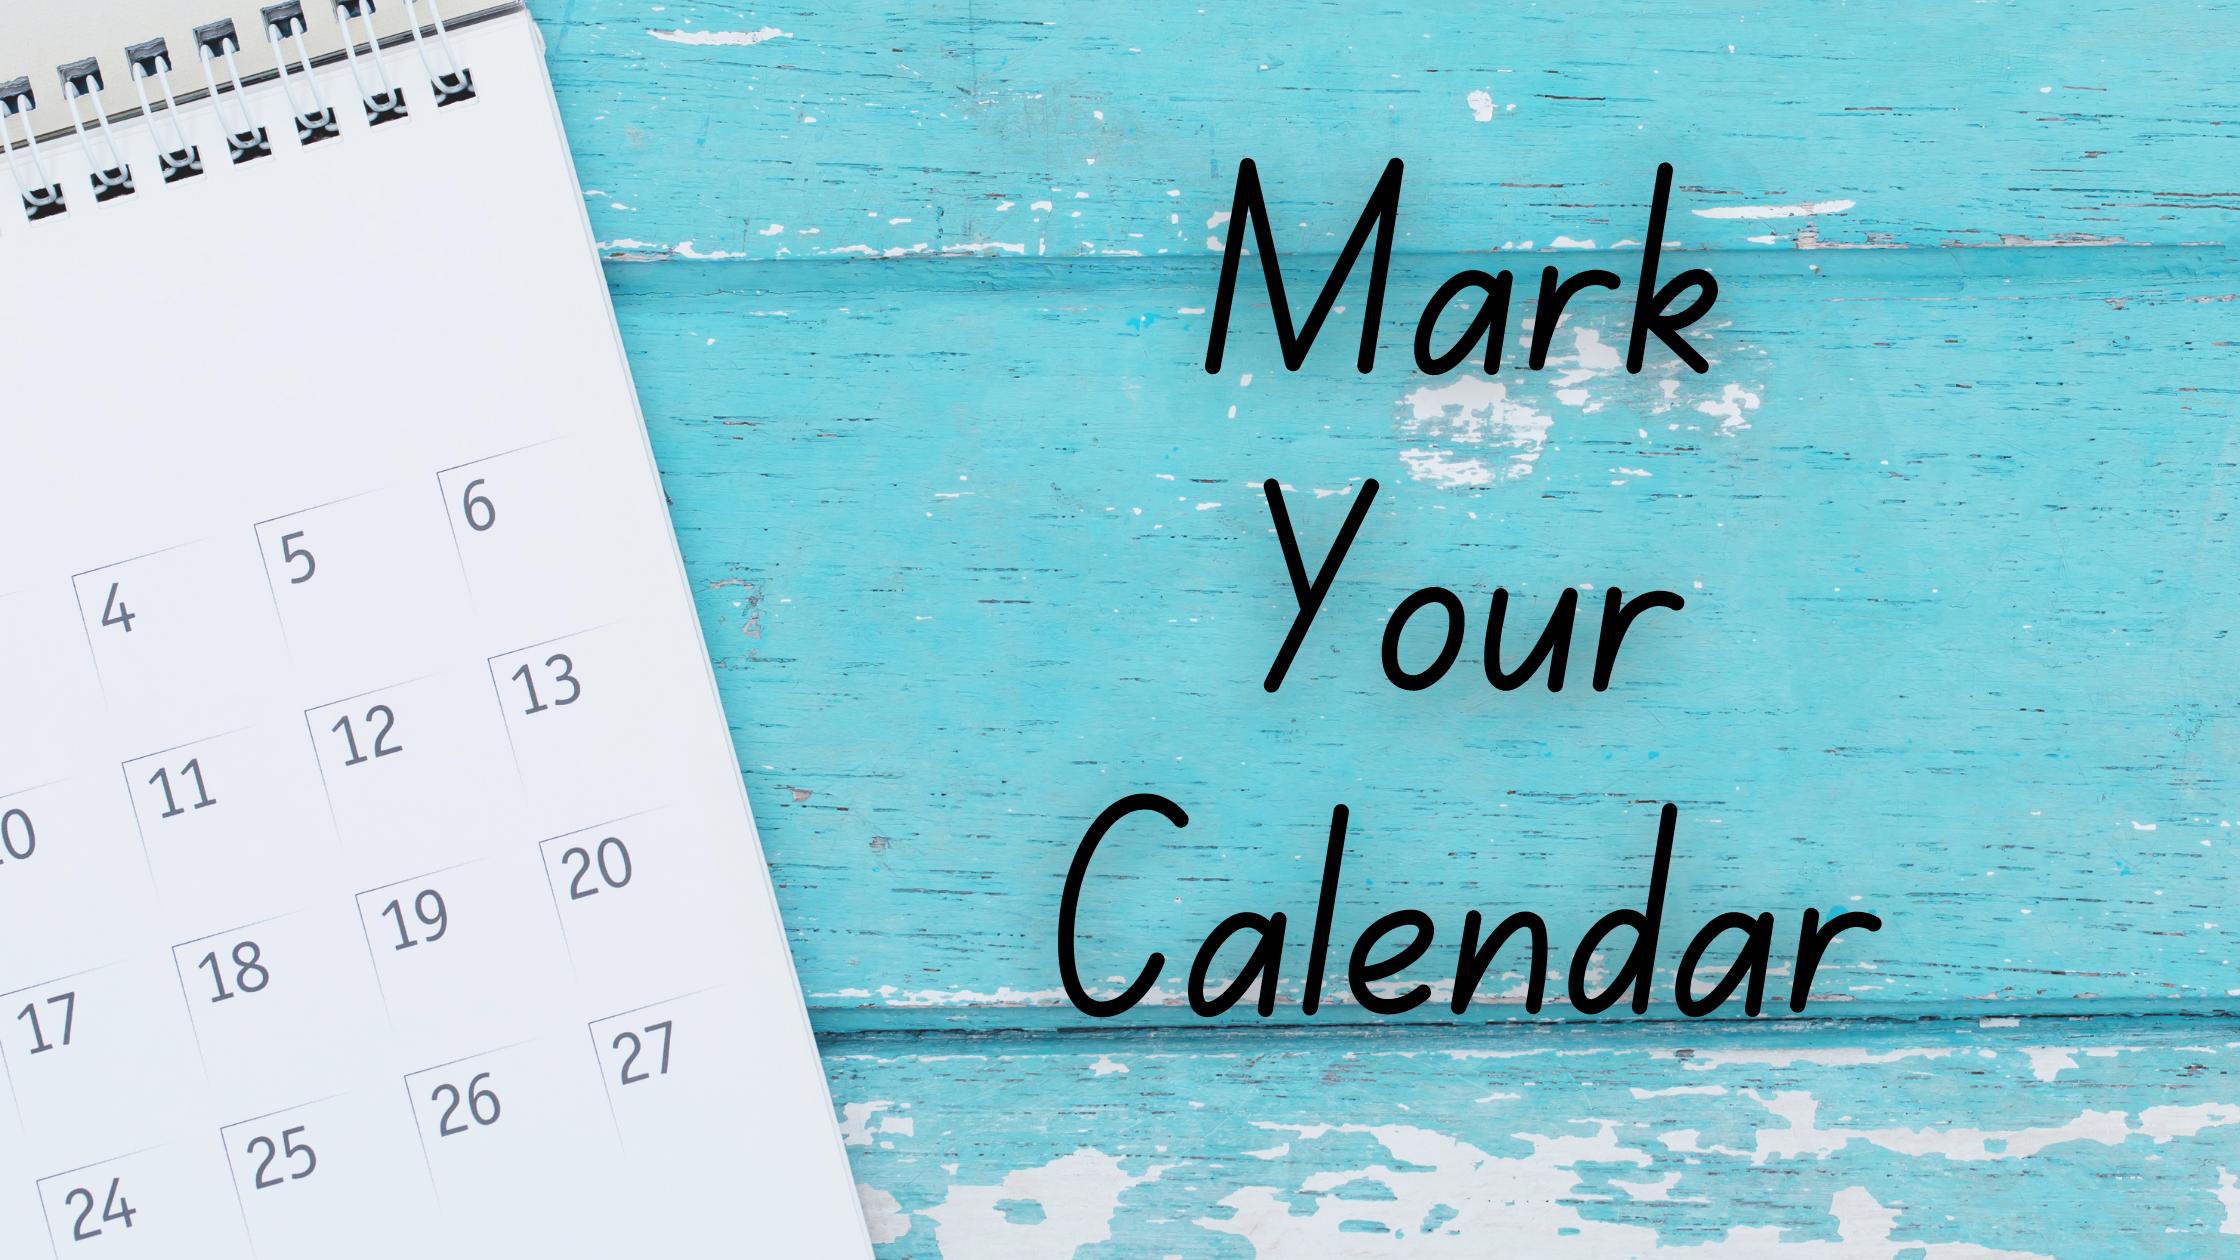 image of a wall calendar on teal wooden planks.  Mark your Calendar